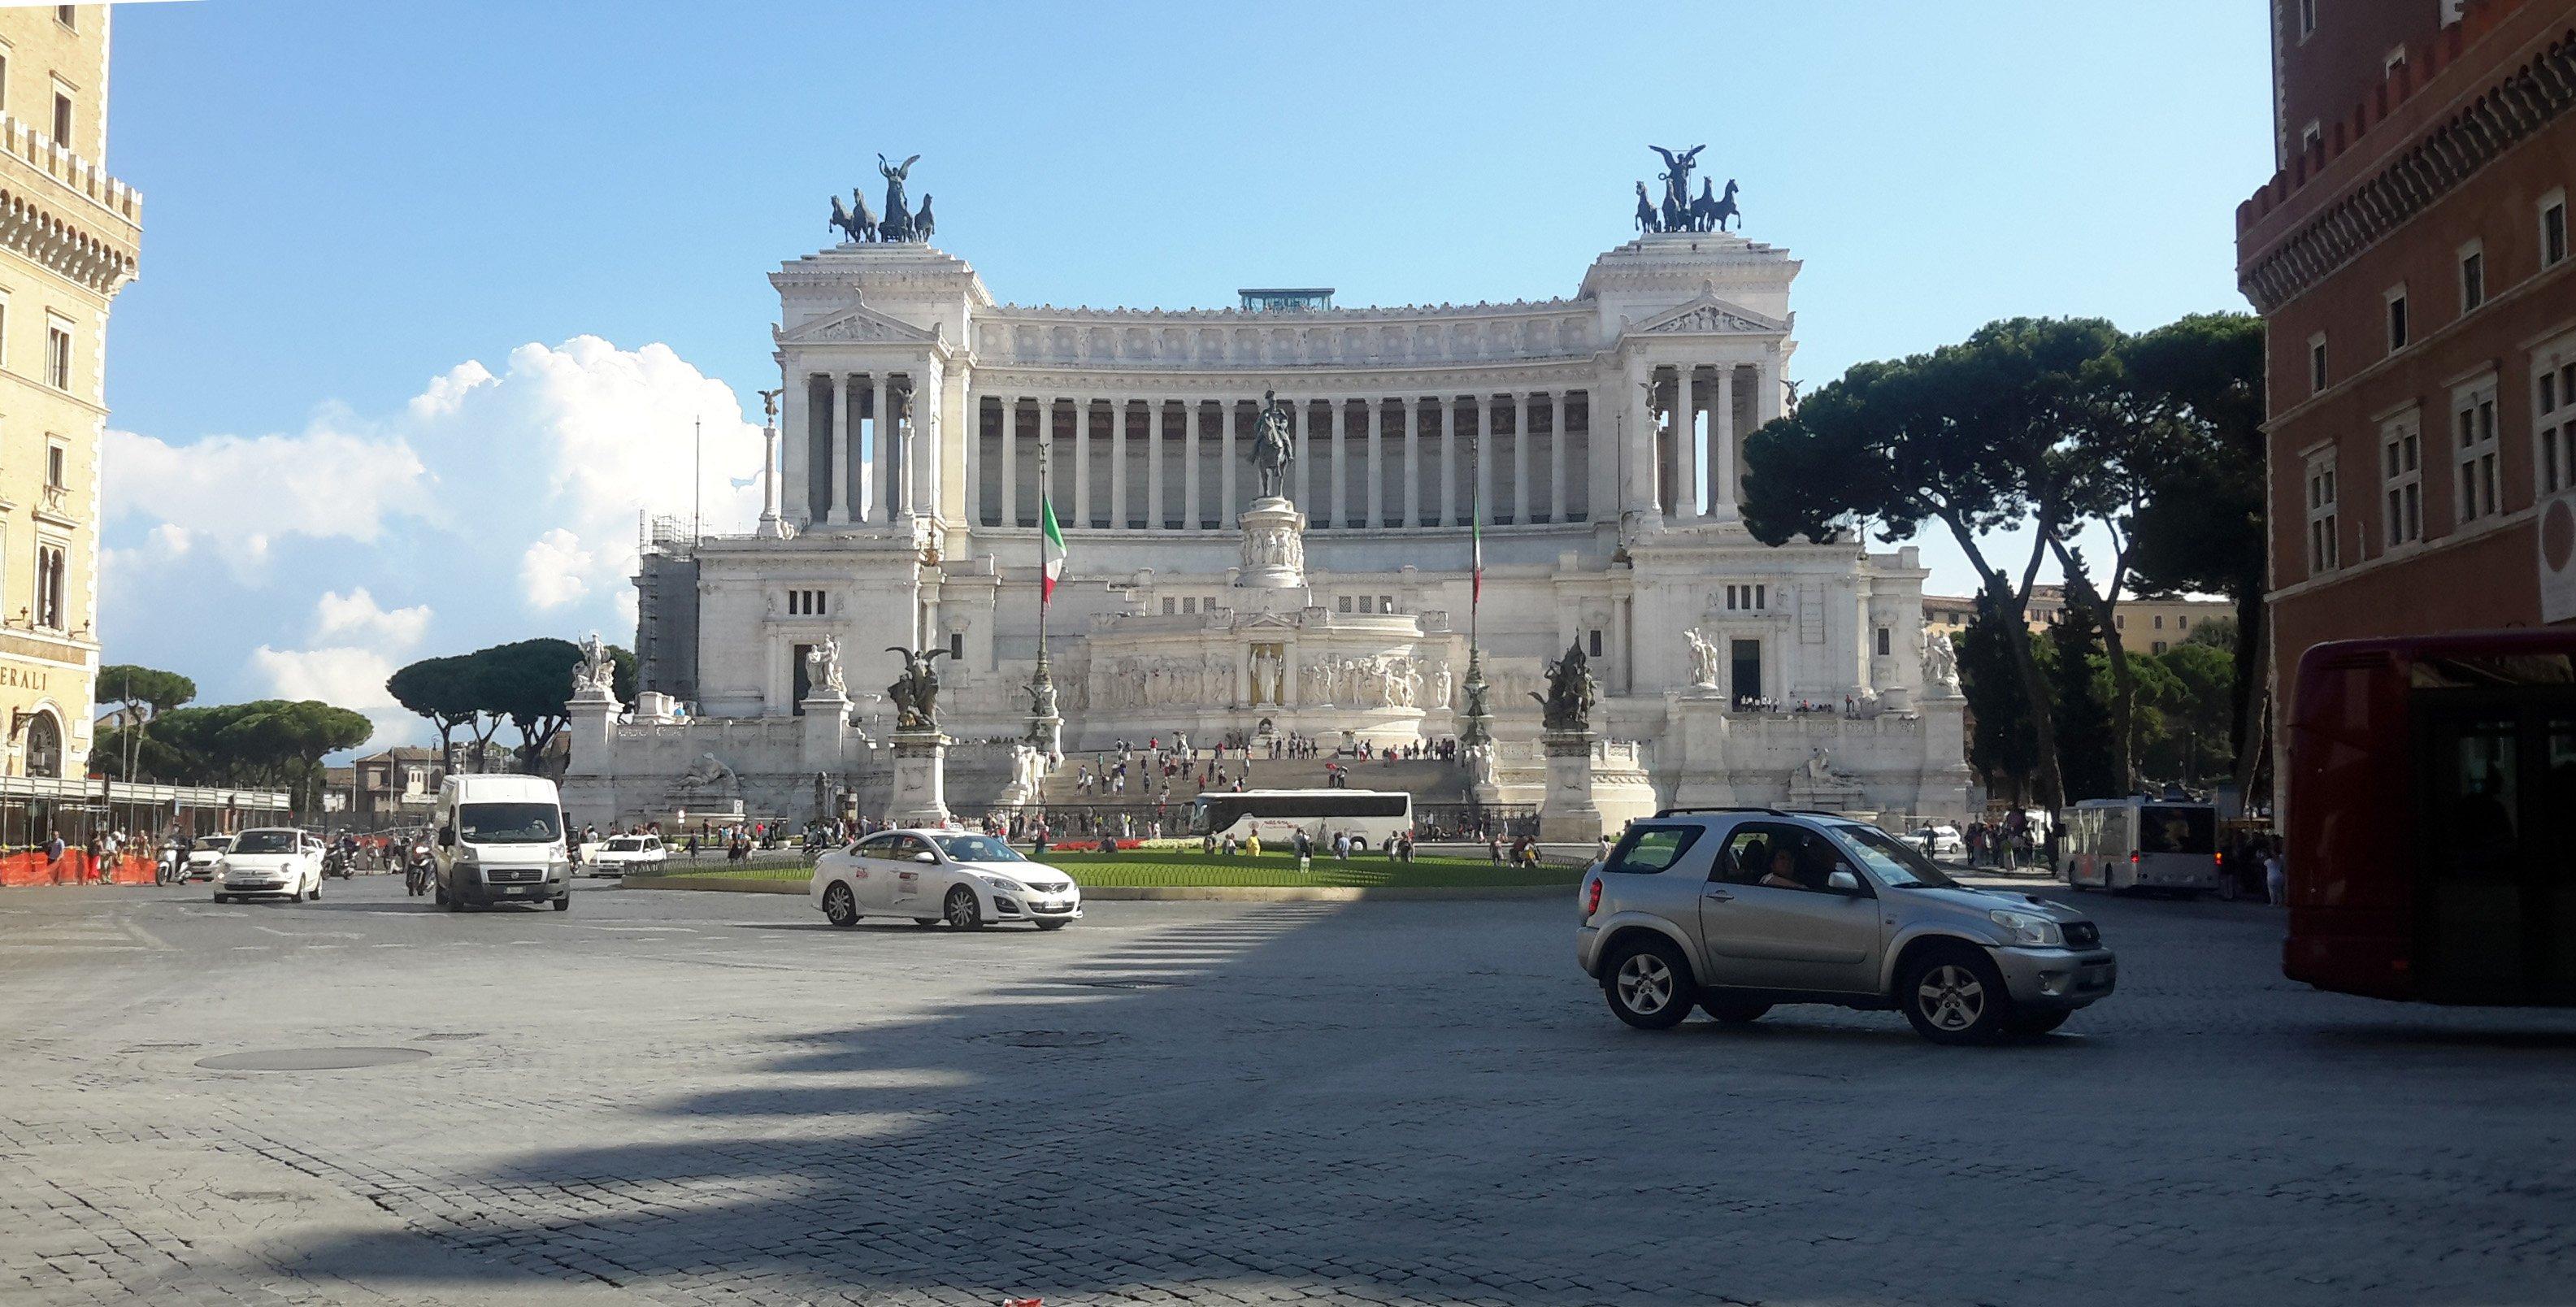 The Altare della Patria, which sits in central Rome, between the Piazza Venezia and the...